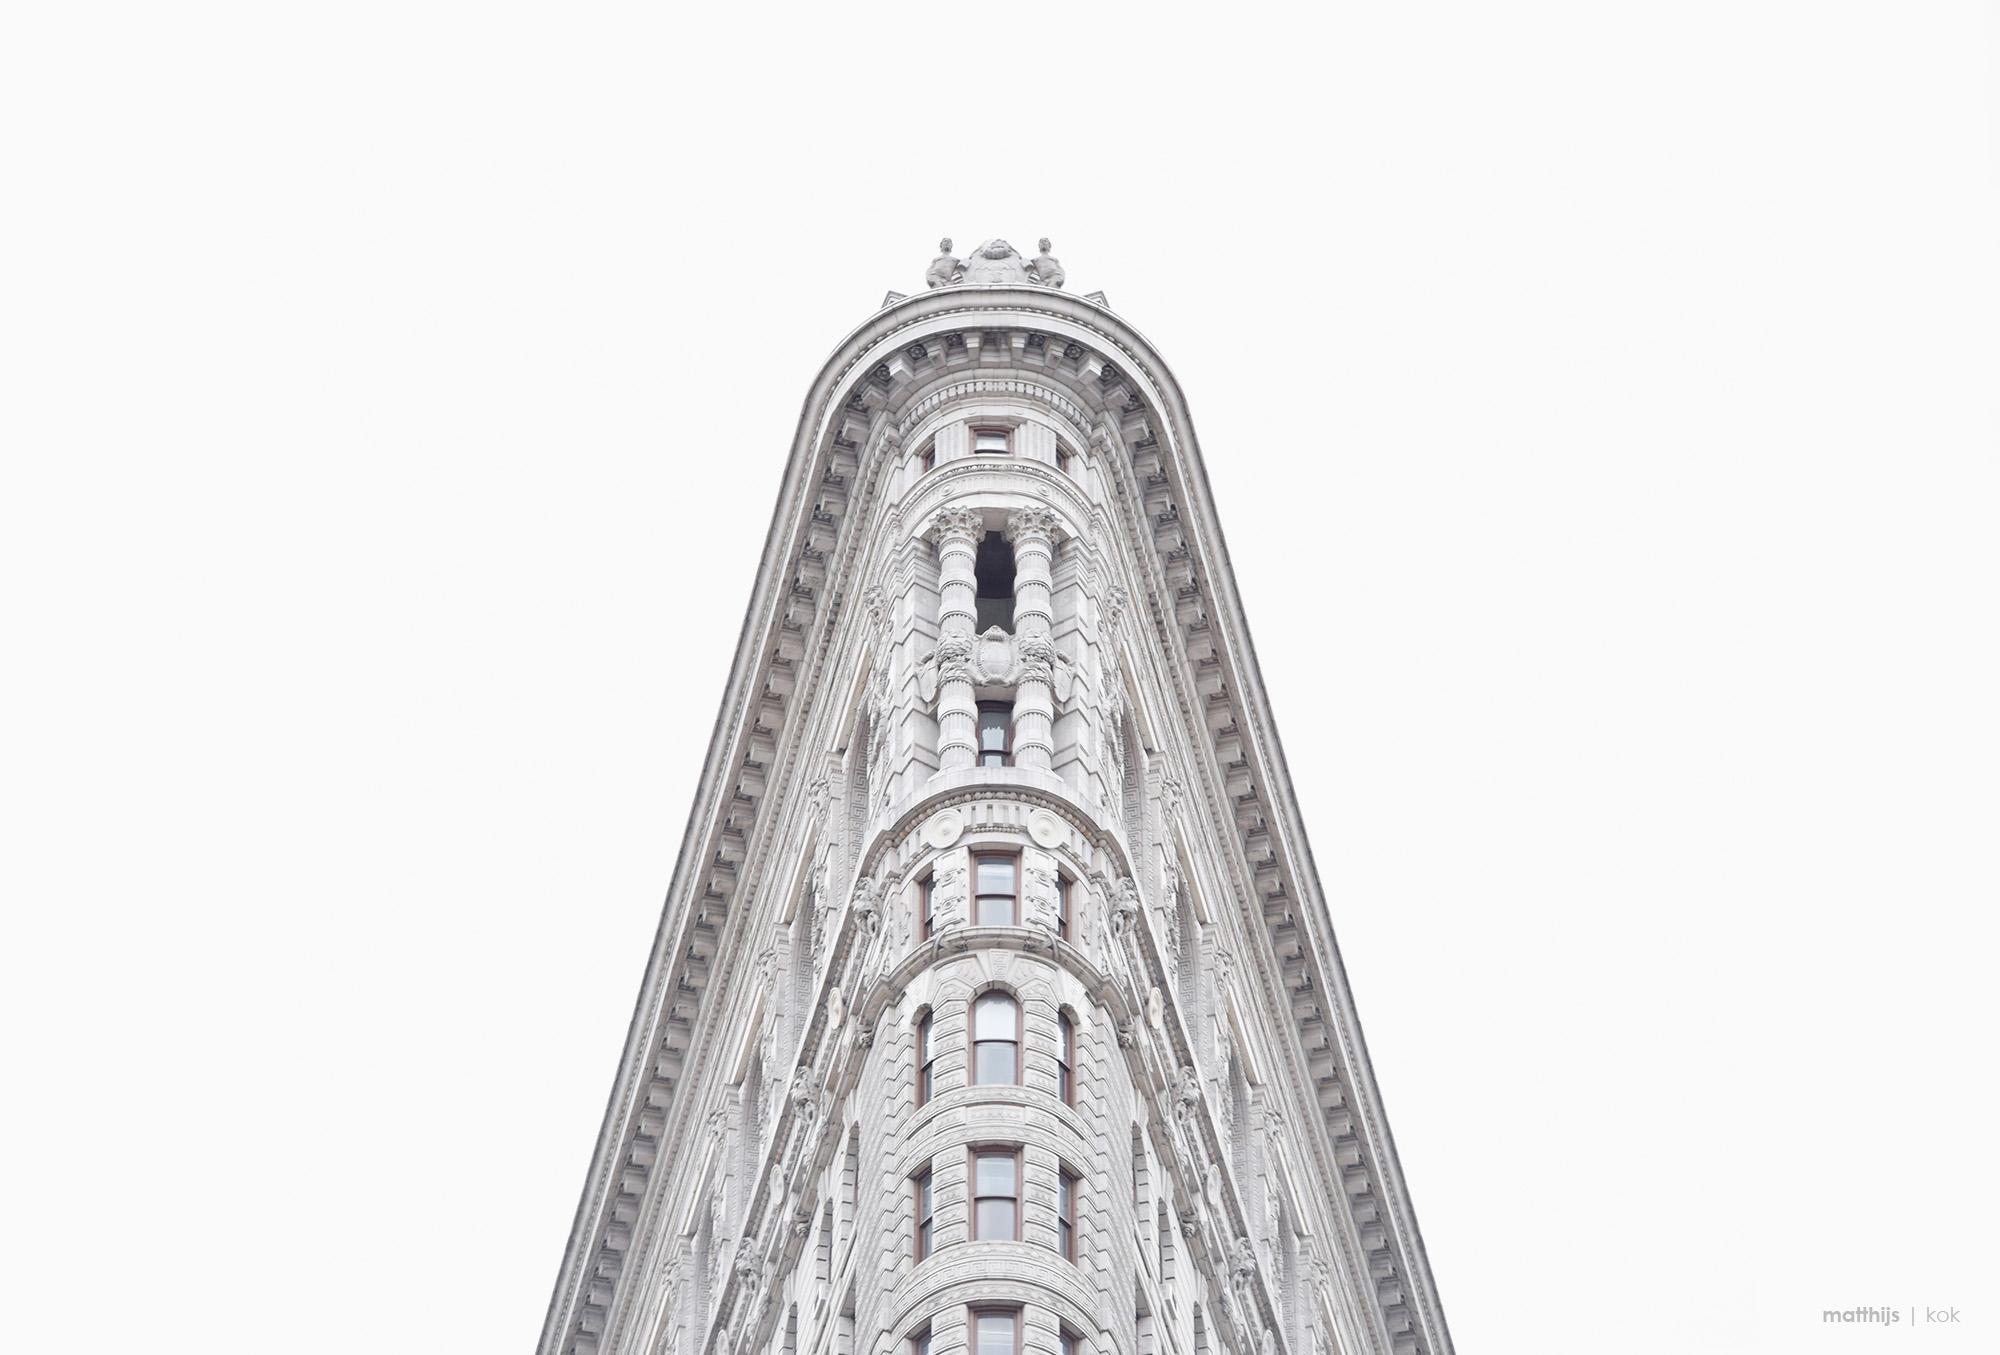 Flatiron Building, New York | Photo by Matthijs Kok